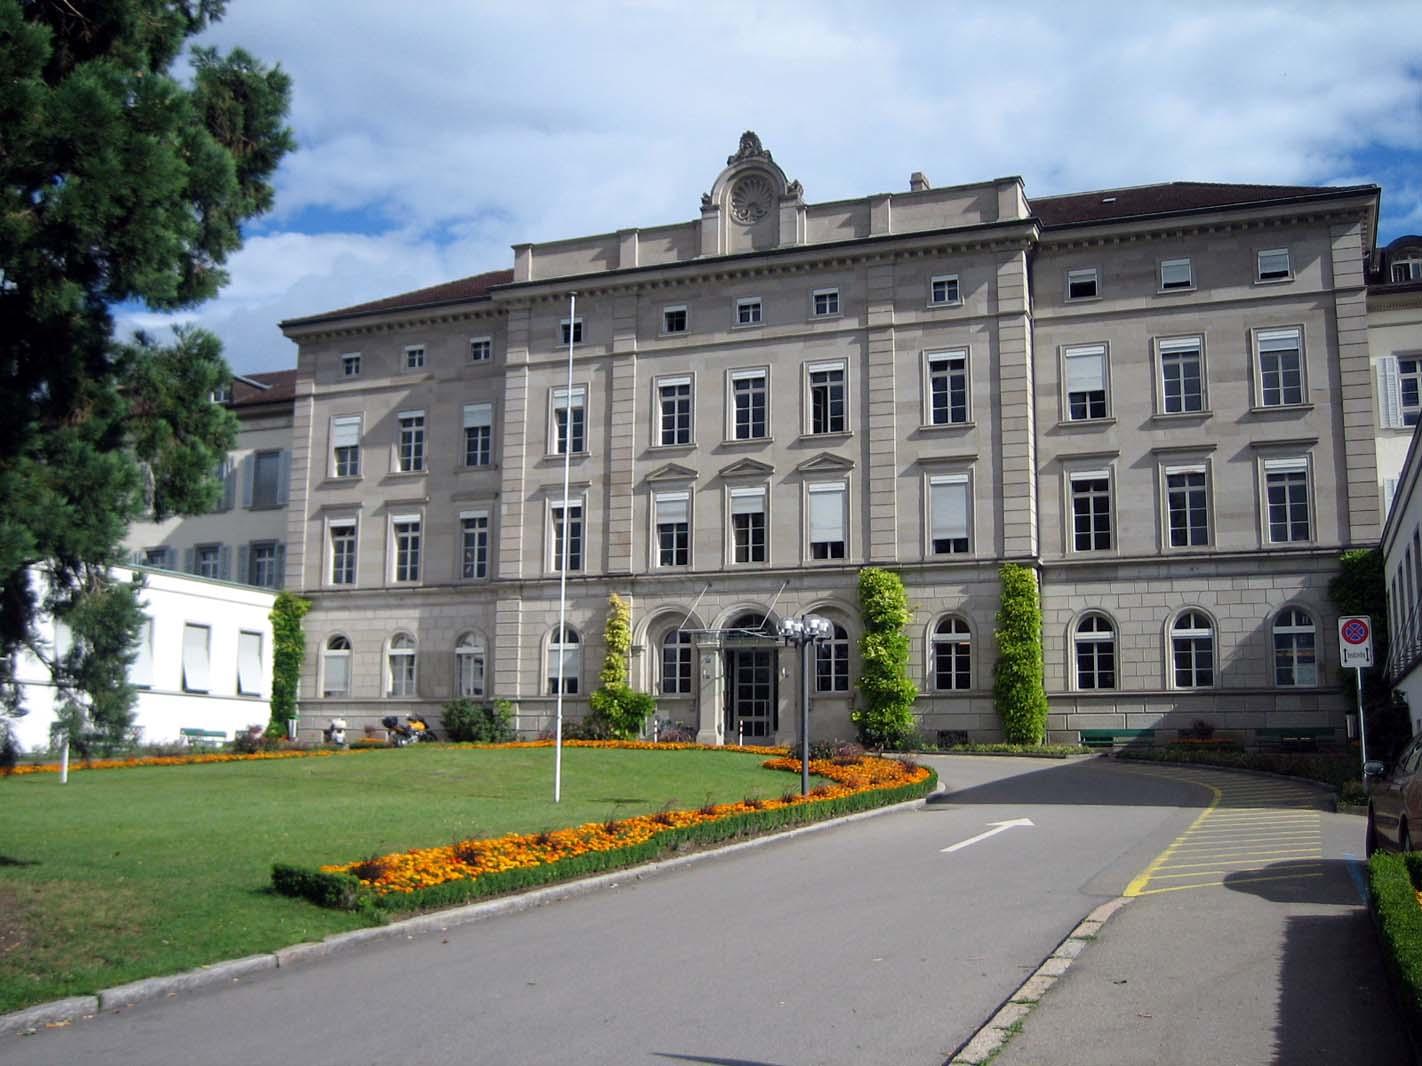 Salvator Mundi Wikipedia >> File:Klinik Burghölzli.jpg - Wikimedia Commons